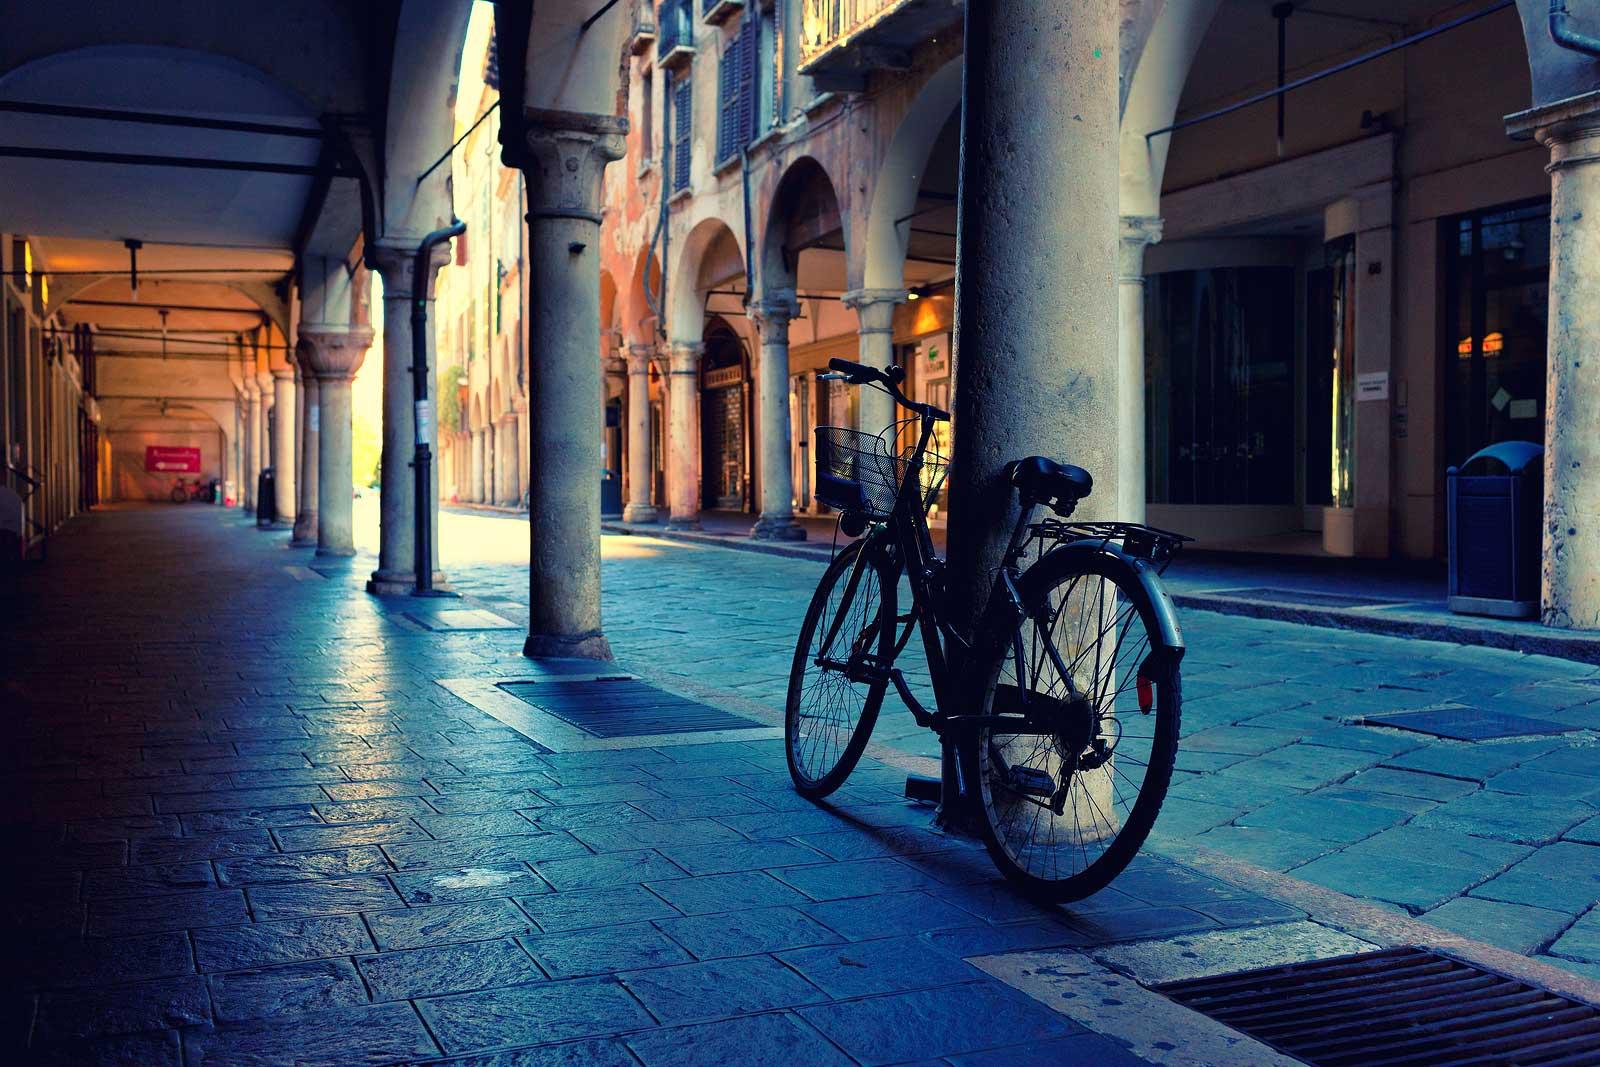 Eventi e manifestazioni a Mantova